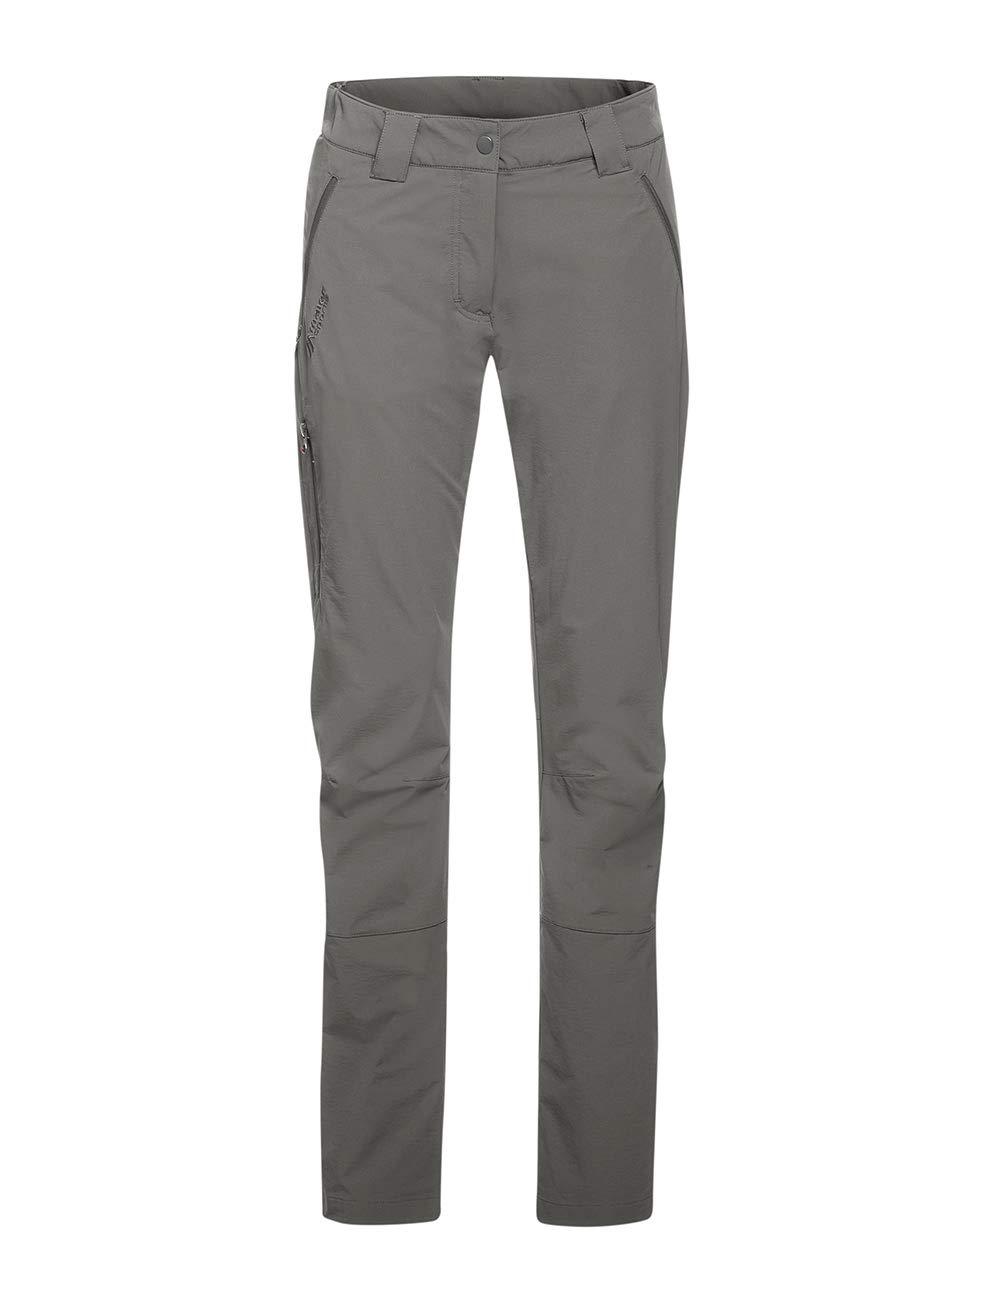 Ardoise Taille 34 Maier Sports Pantalon